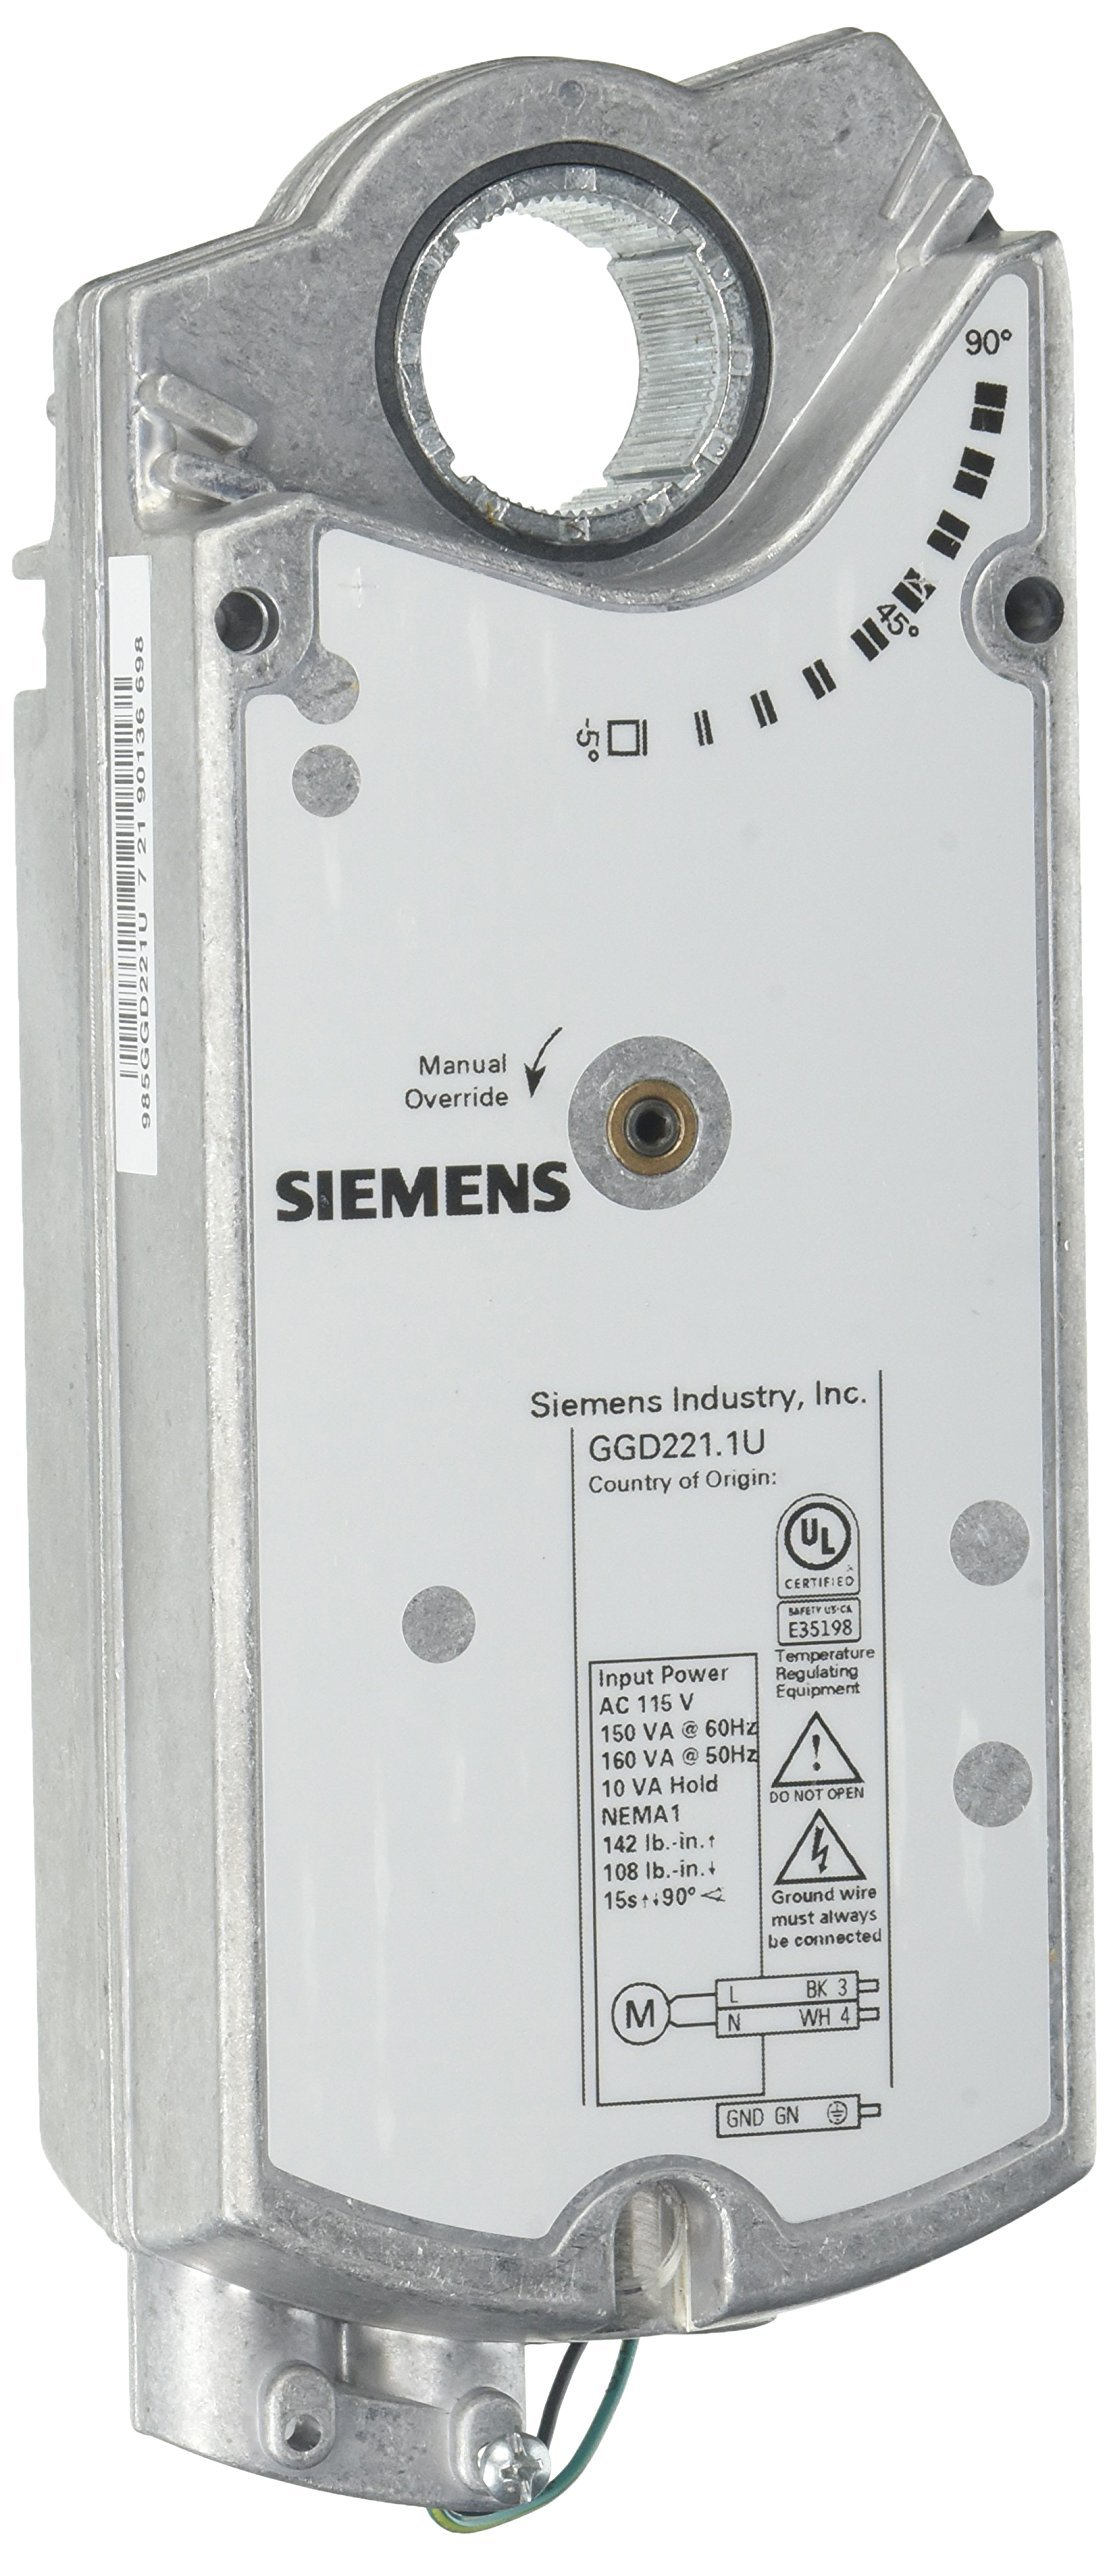 Siemens GGD221.1U F/S,2PT,115V,142LB-IN,STSHAFT